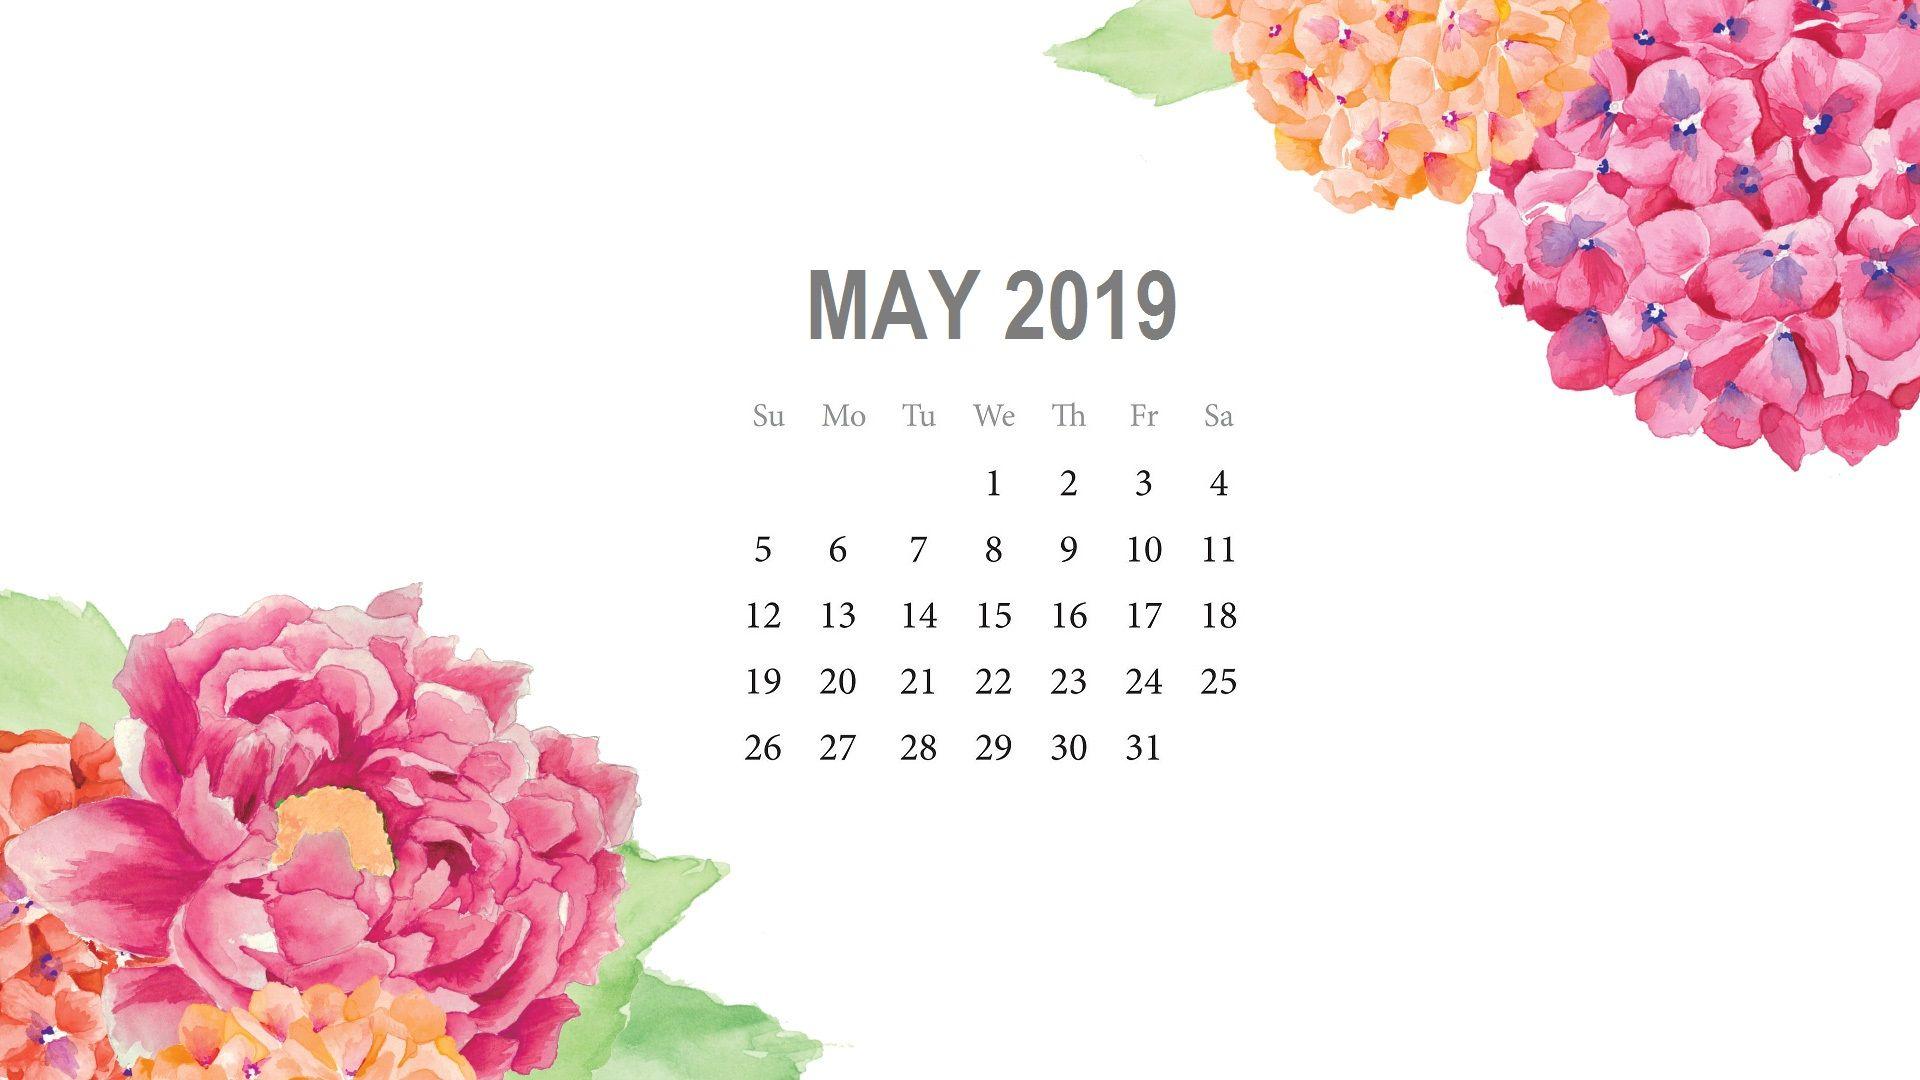 May 2019 Desktop Calendar Wallpaper 1920x1080